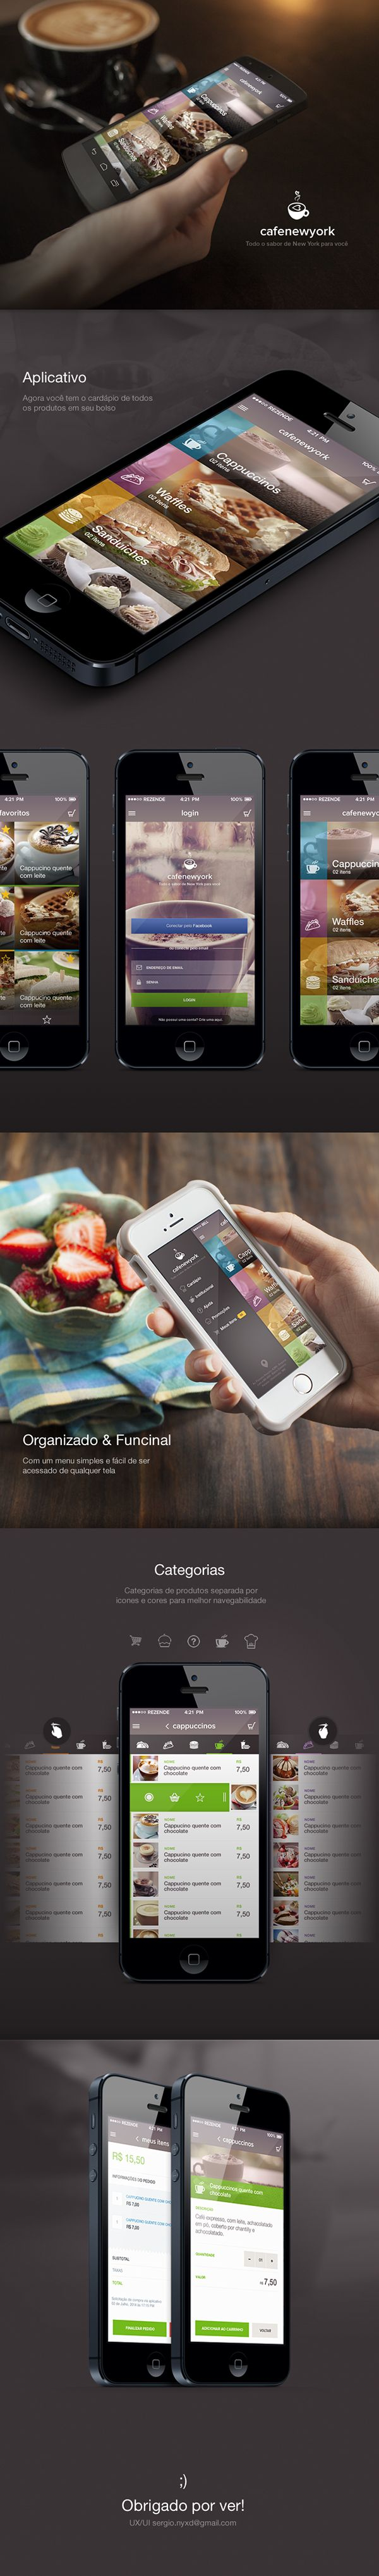 Cafe New Yokr - APP by Sergio Vieira, via Behance